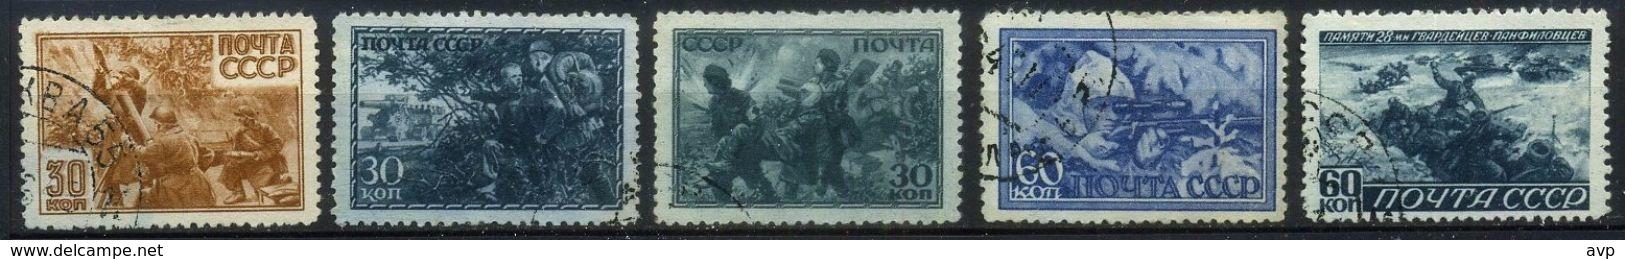 USSR 1943 Michel 865-869 Great Patriotic War, History, WWII, World War II Used - 1923-1991 URSS